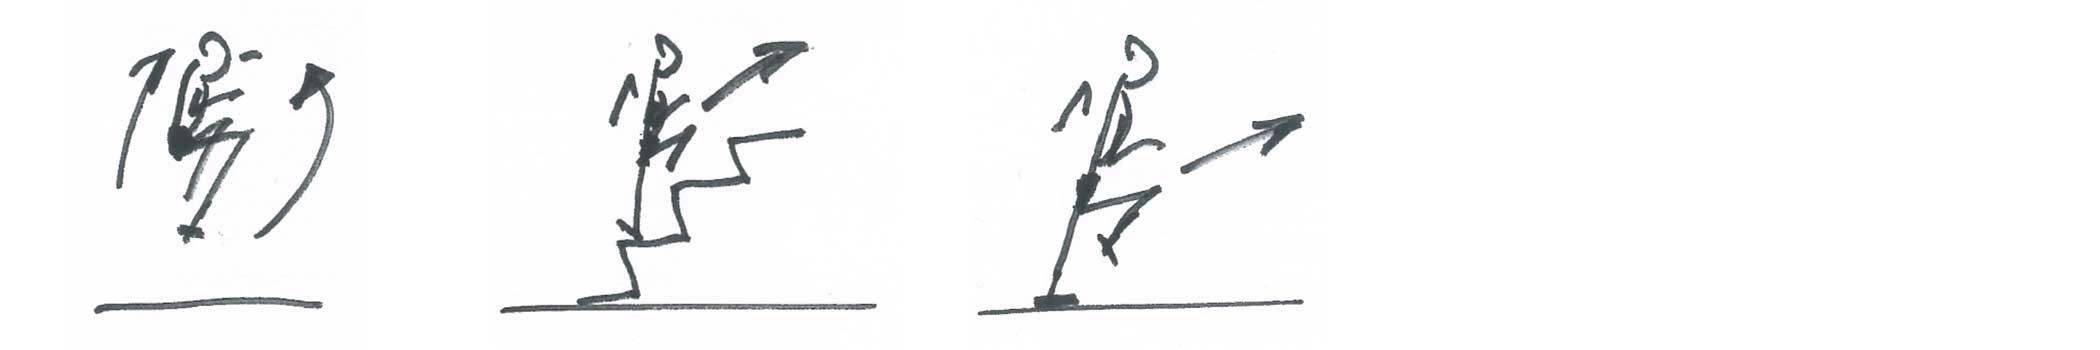 Jambes Jean-claude Perrin